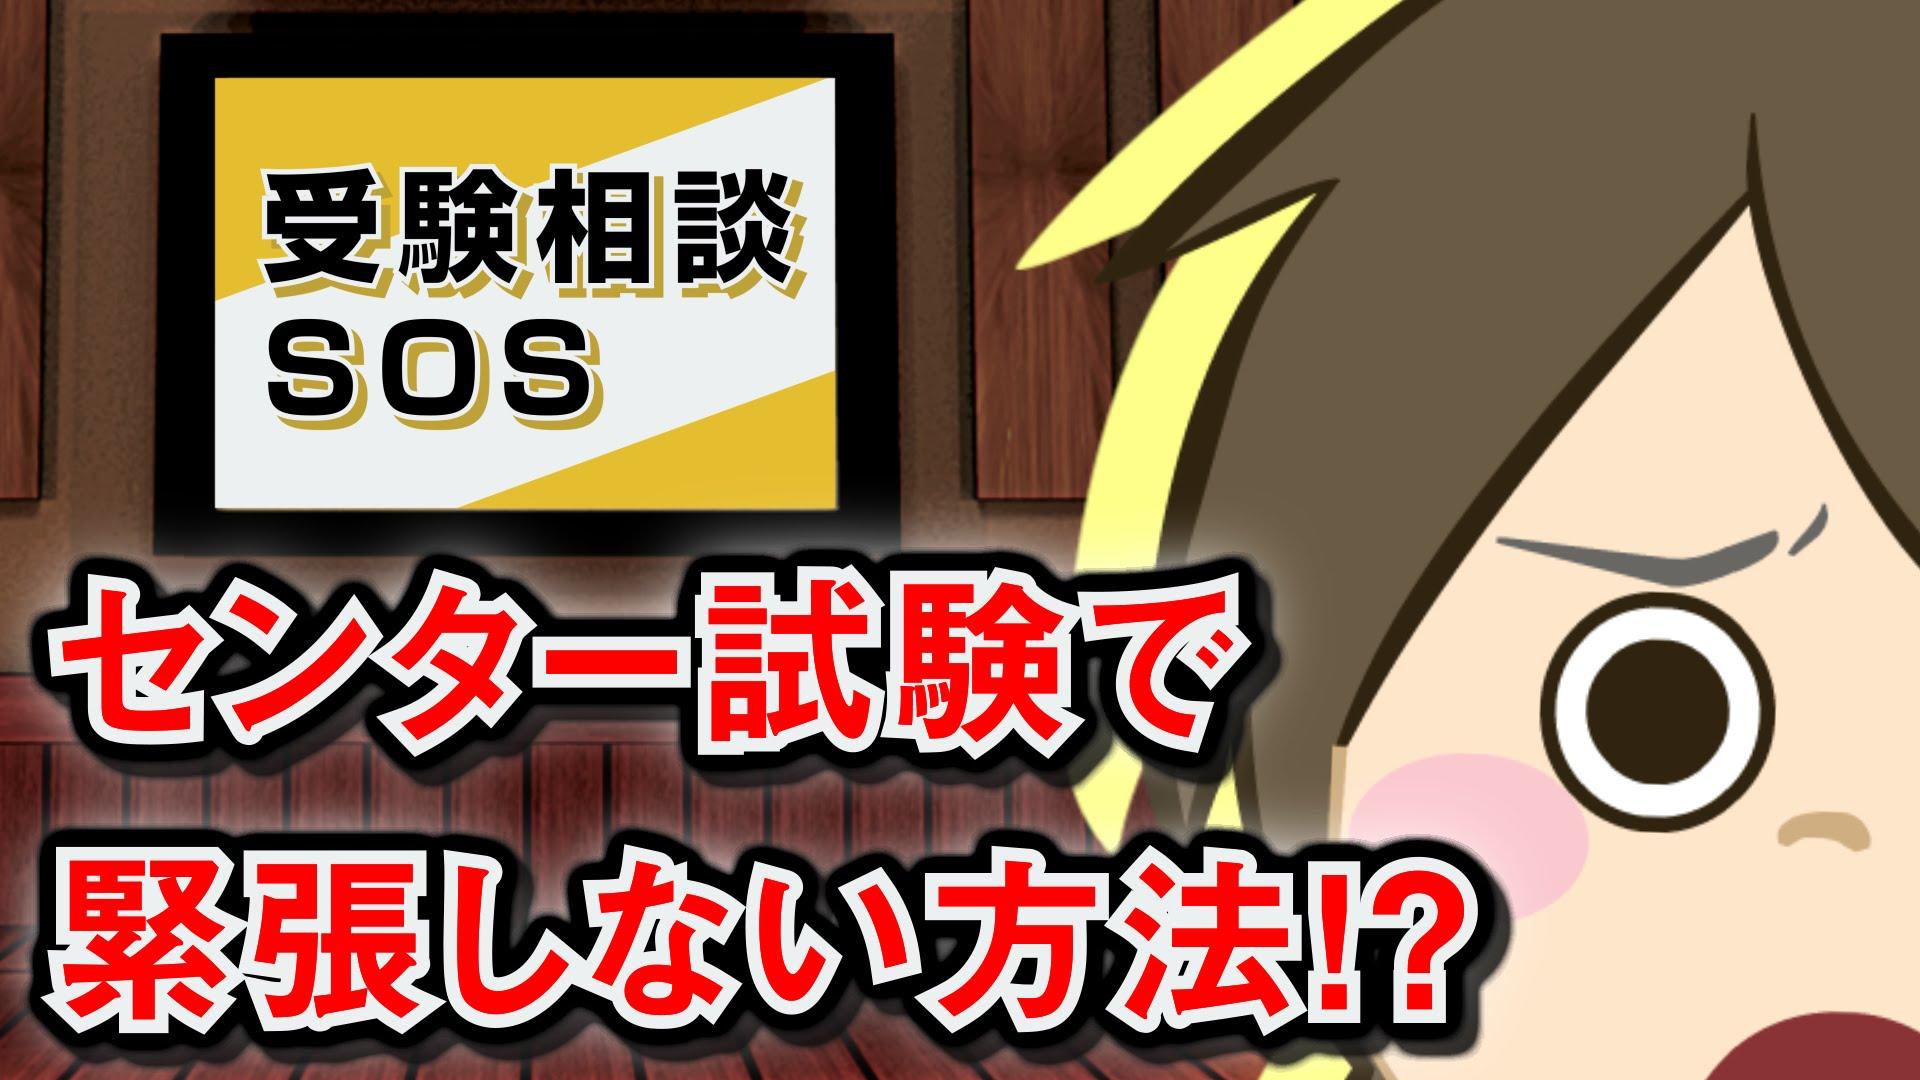 【vol.46】センター試験で緊張しない方法!?|受験相談SOS